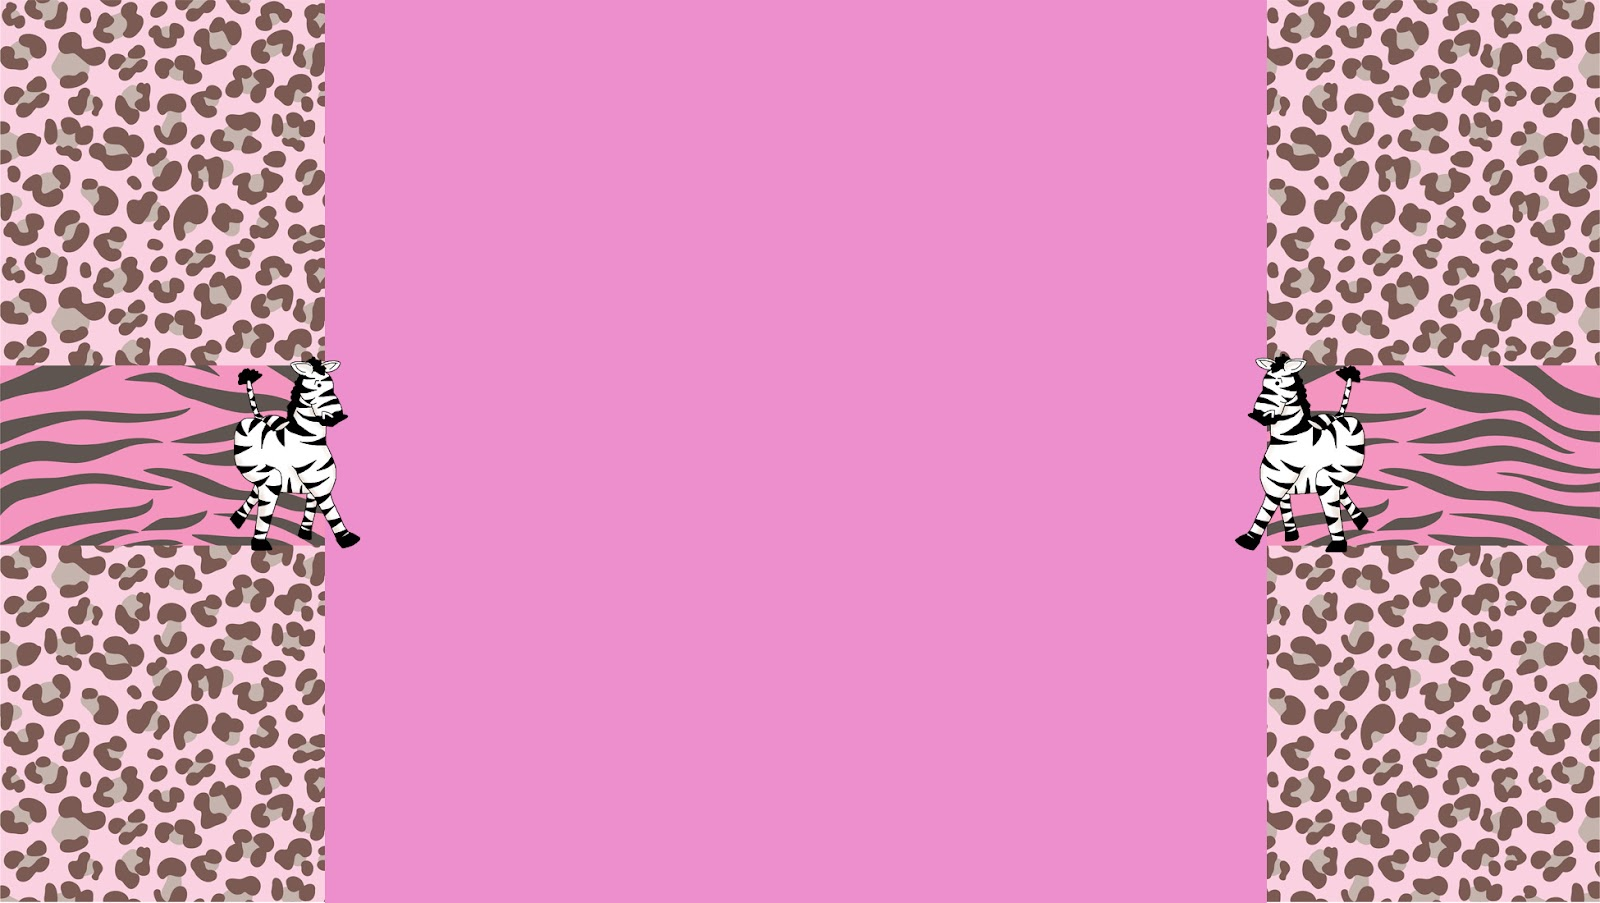 Baby pink cheetah print background - photo#29